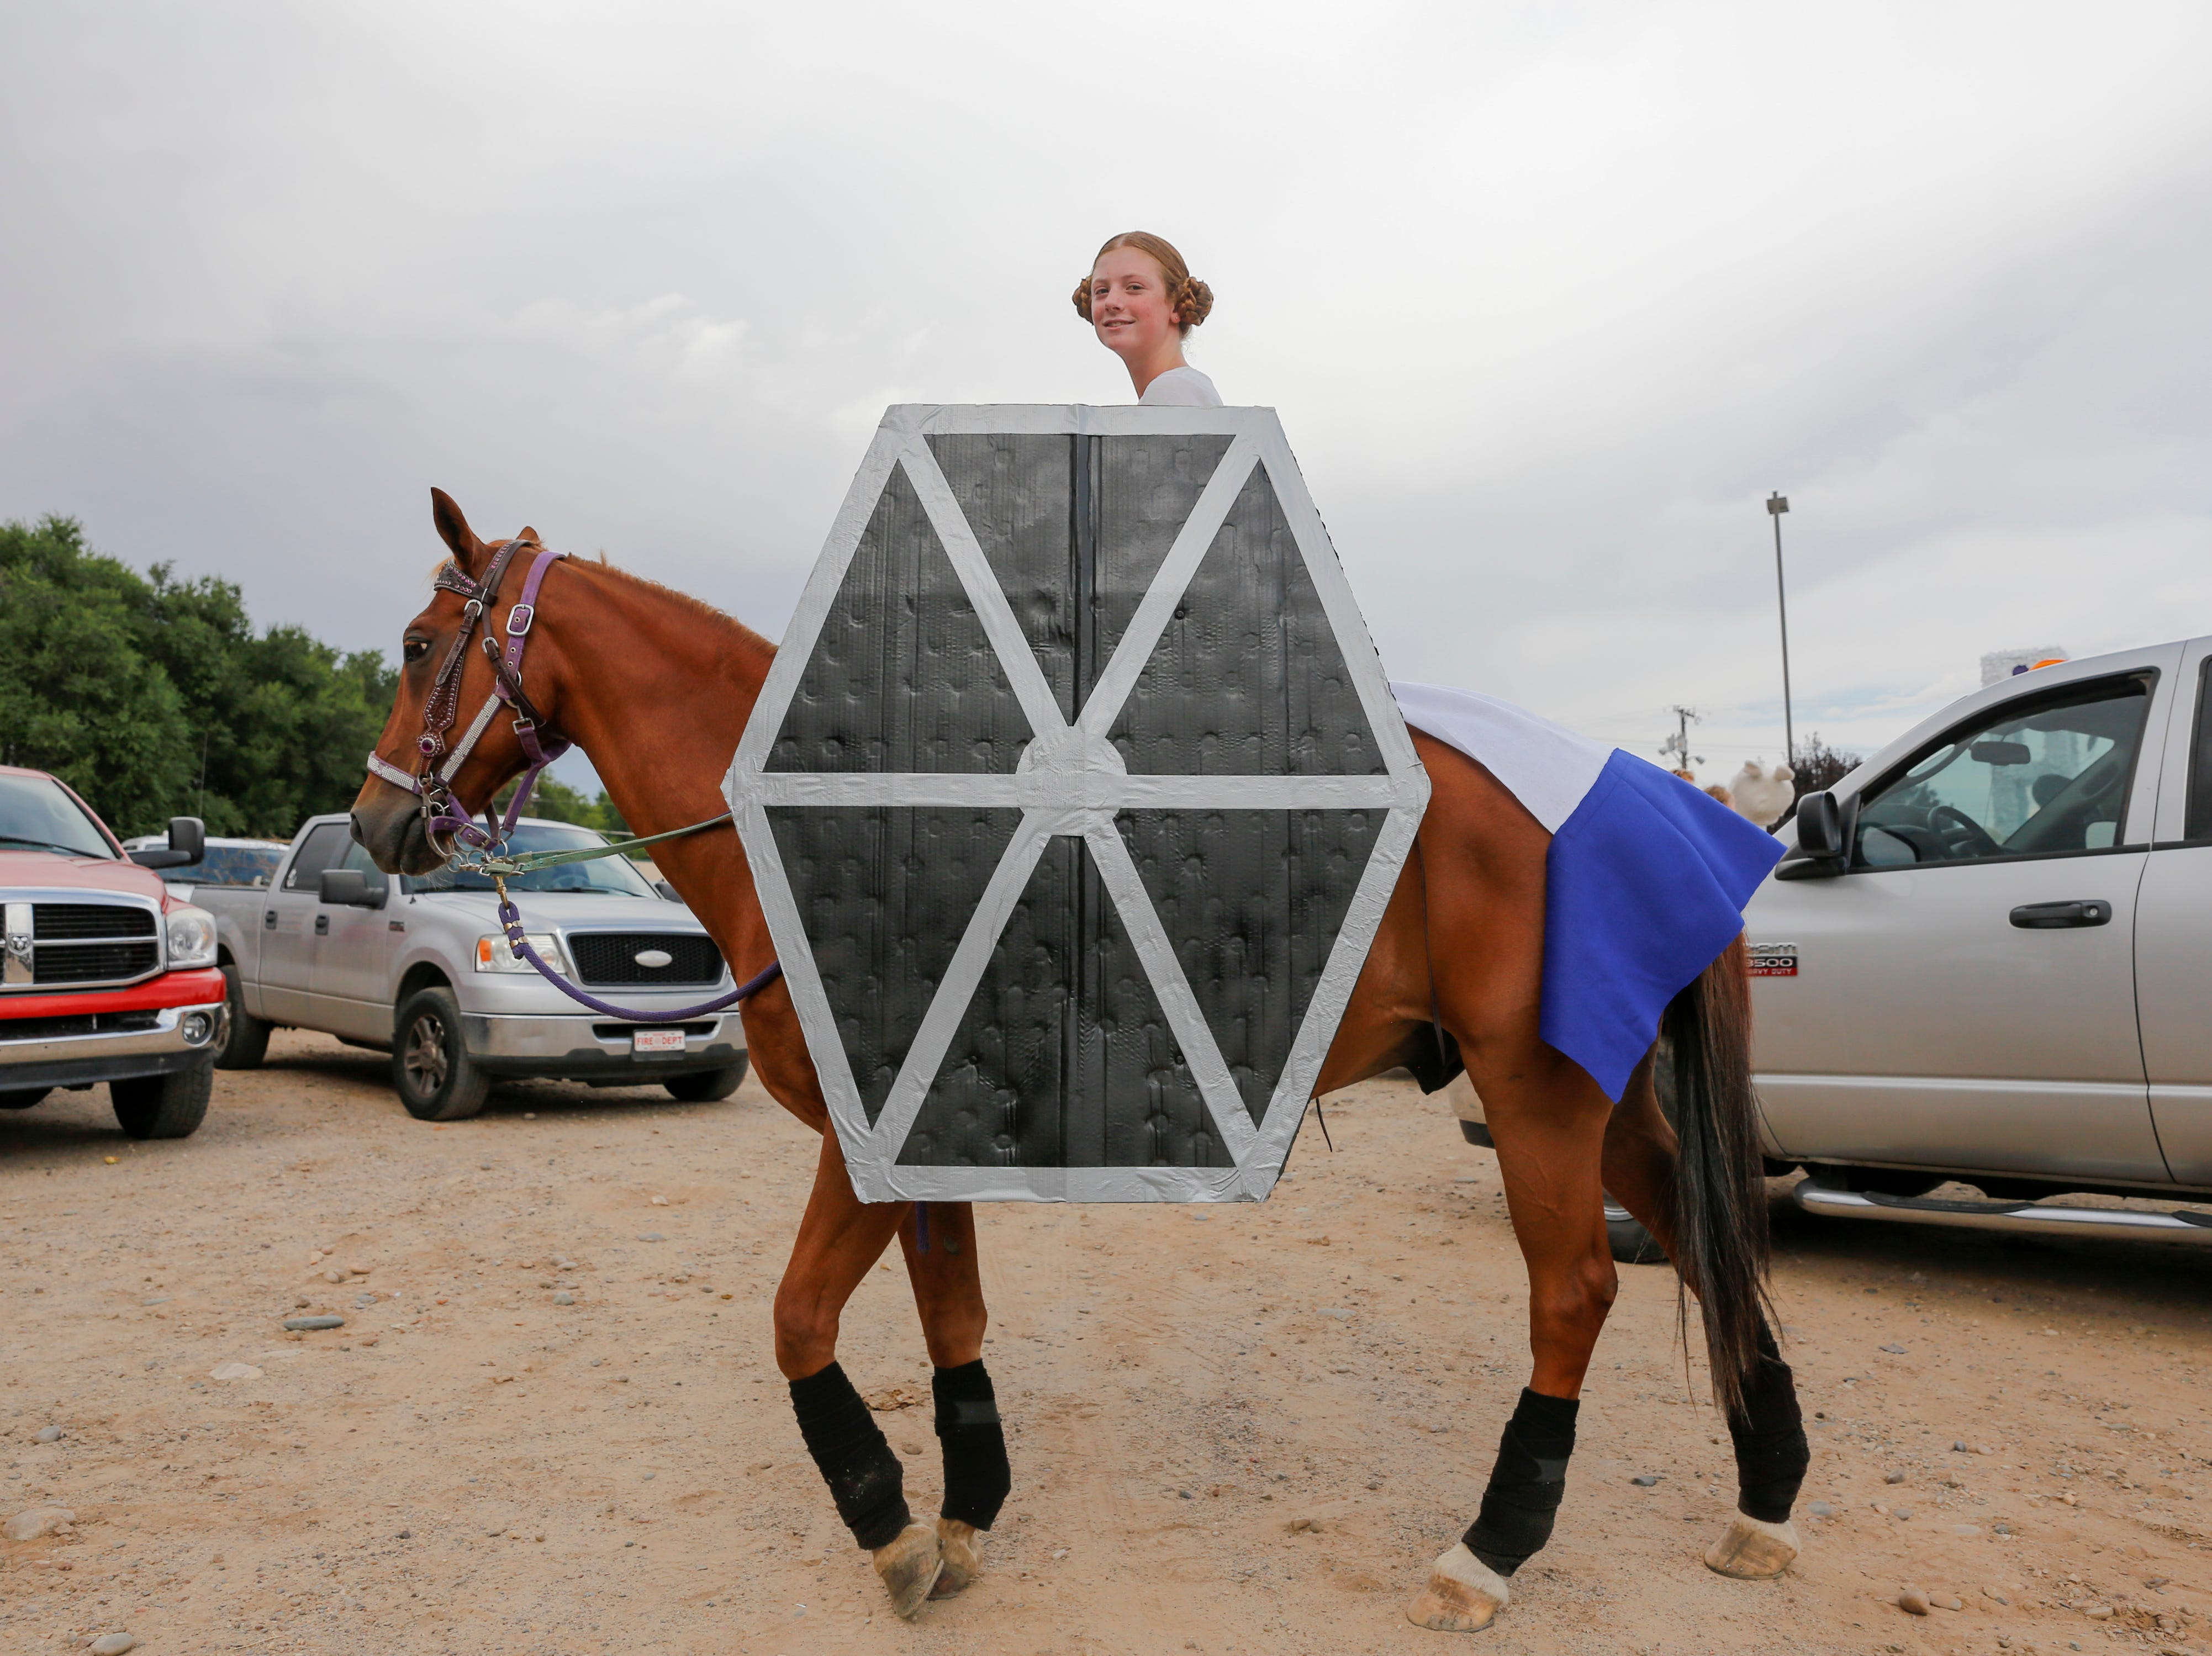 Kimber Harvey and her horse Dazzle prepare for the start of the San Juan County Fair Parade, Friday, Aug. 10, 2018 on Main Street in Farmington.